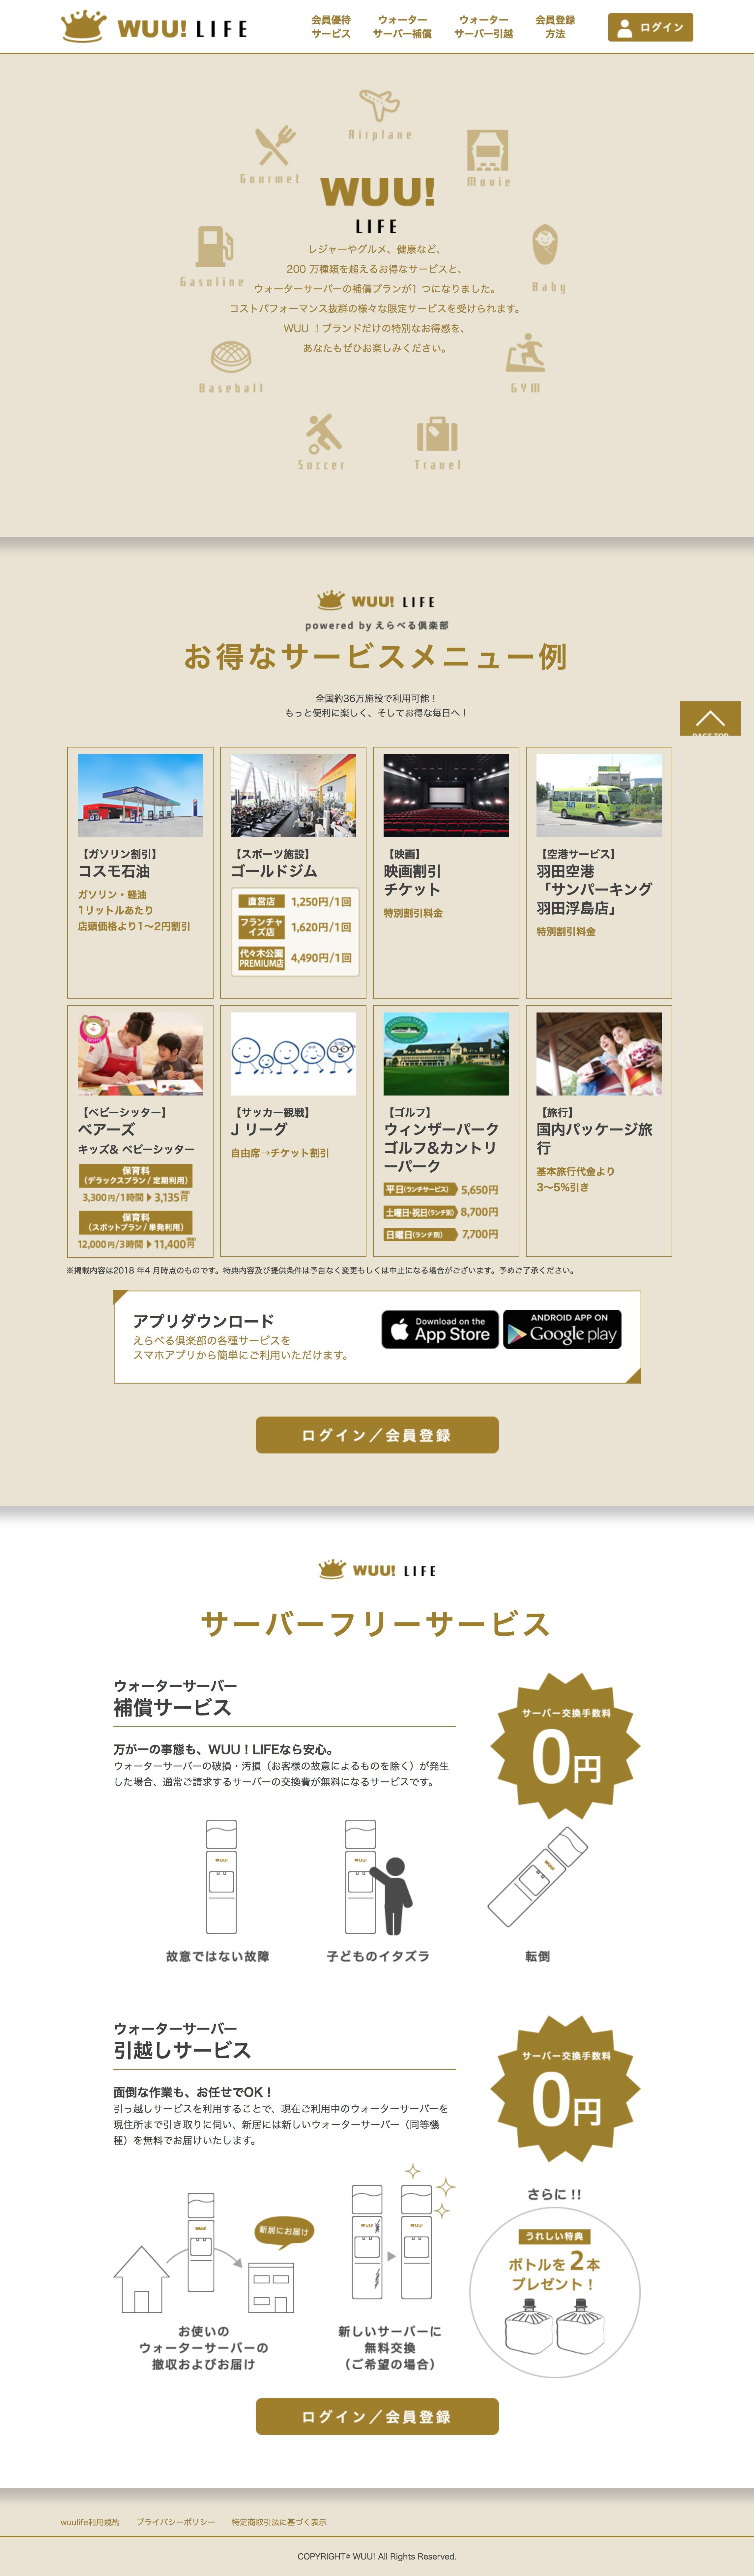 WUU!LIFE サービスサイト